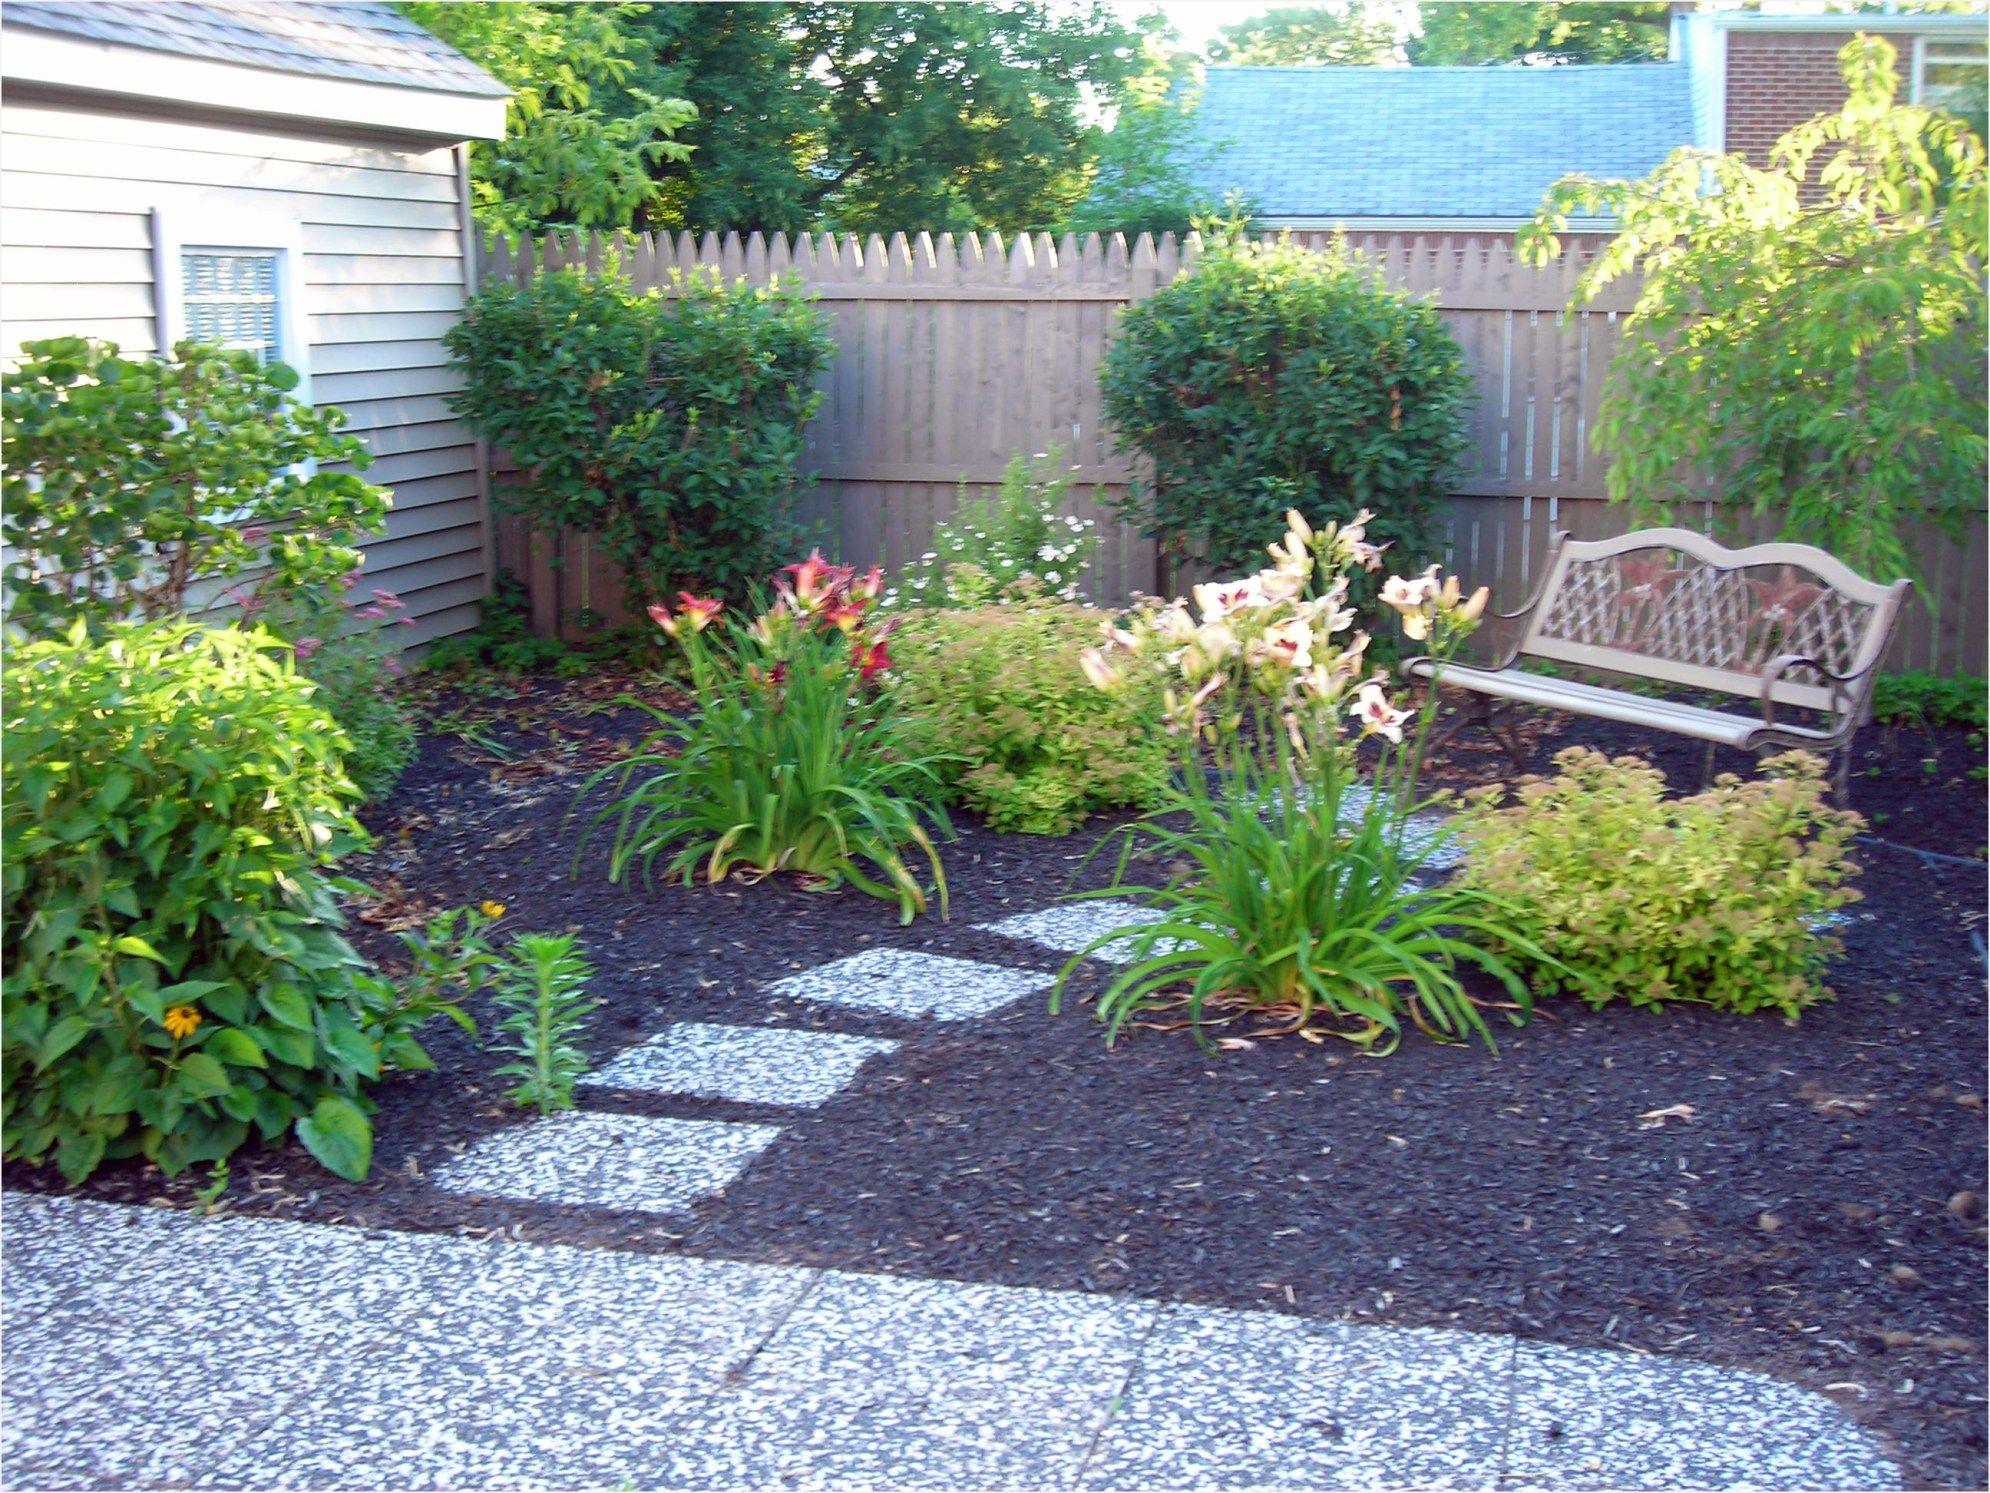 40 Perfect Backyard Landscape Ideas Without Grass | No ...